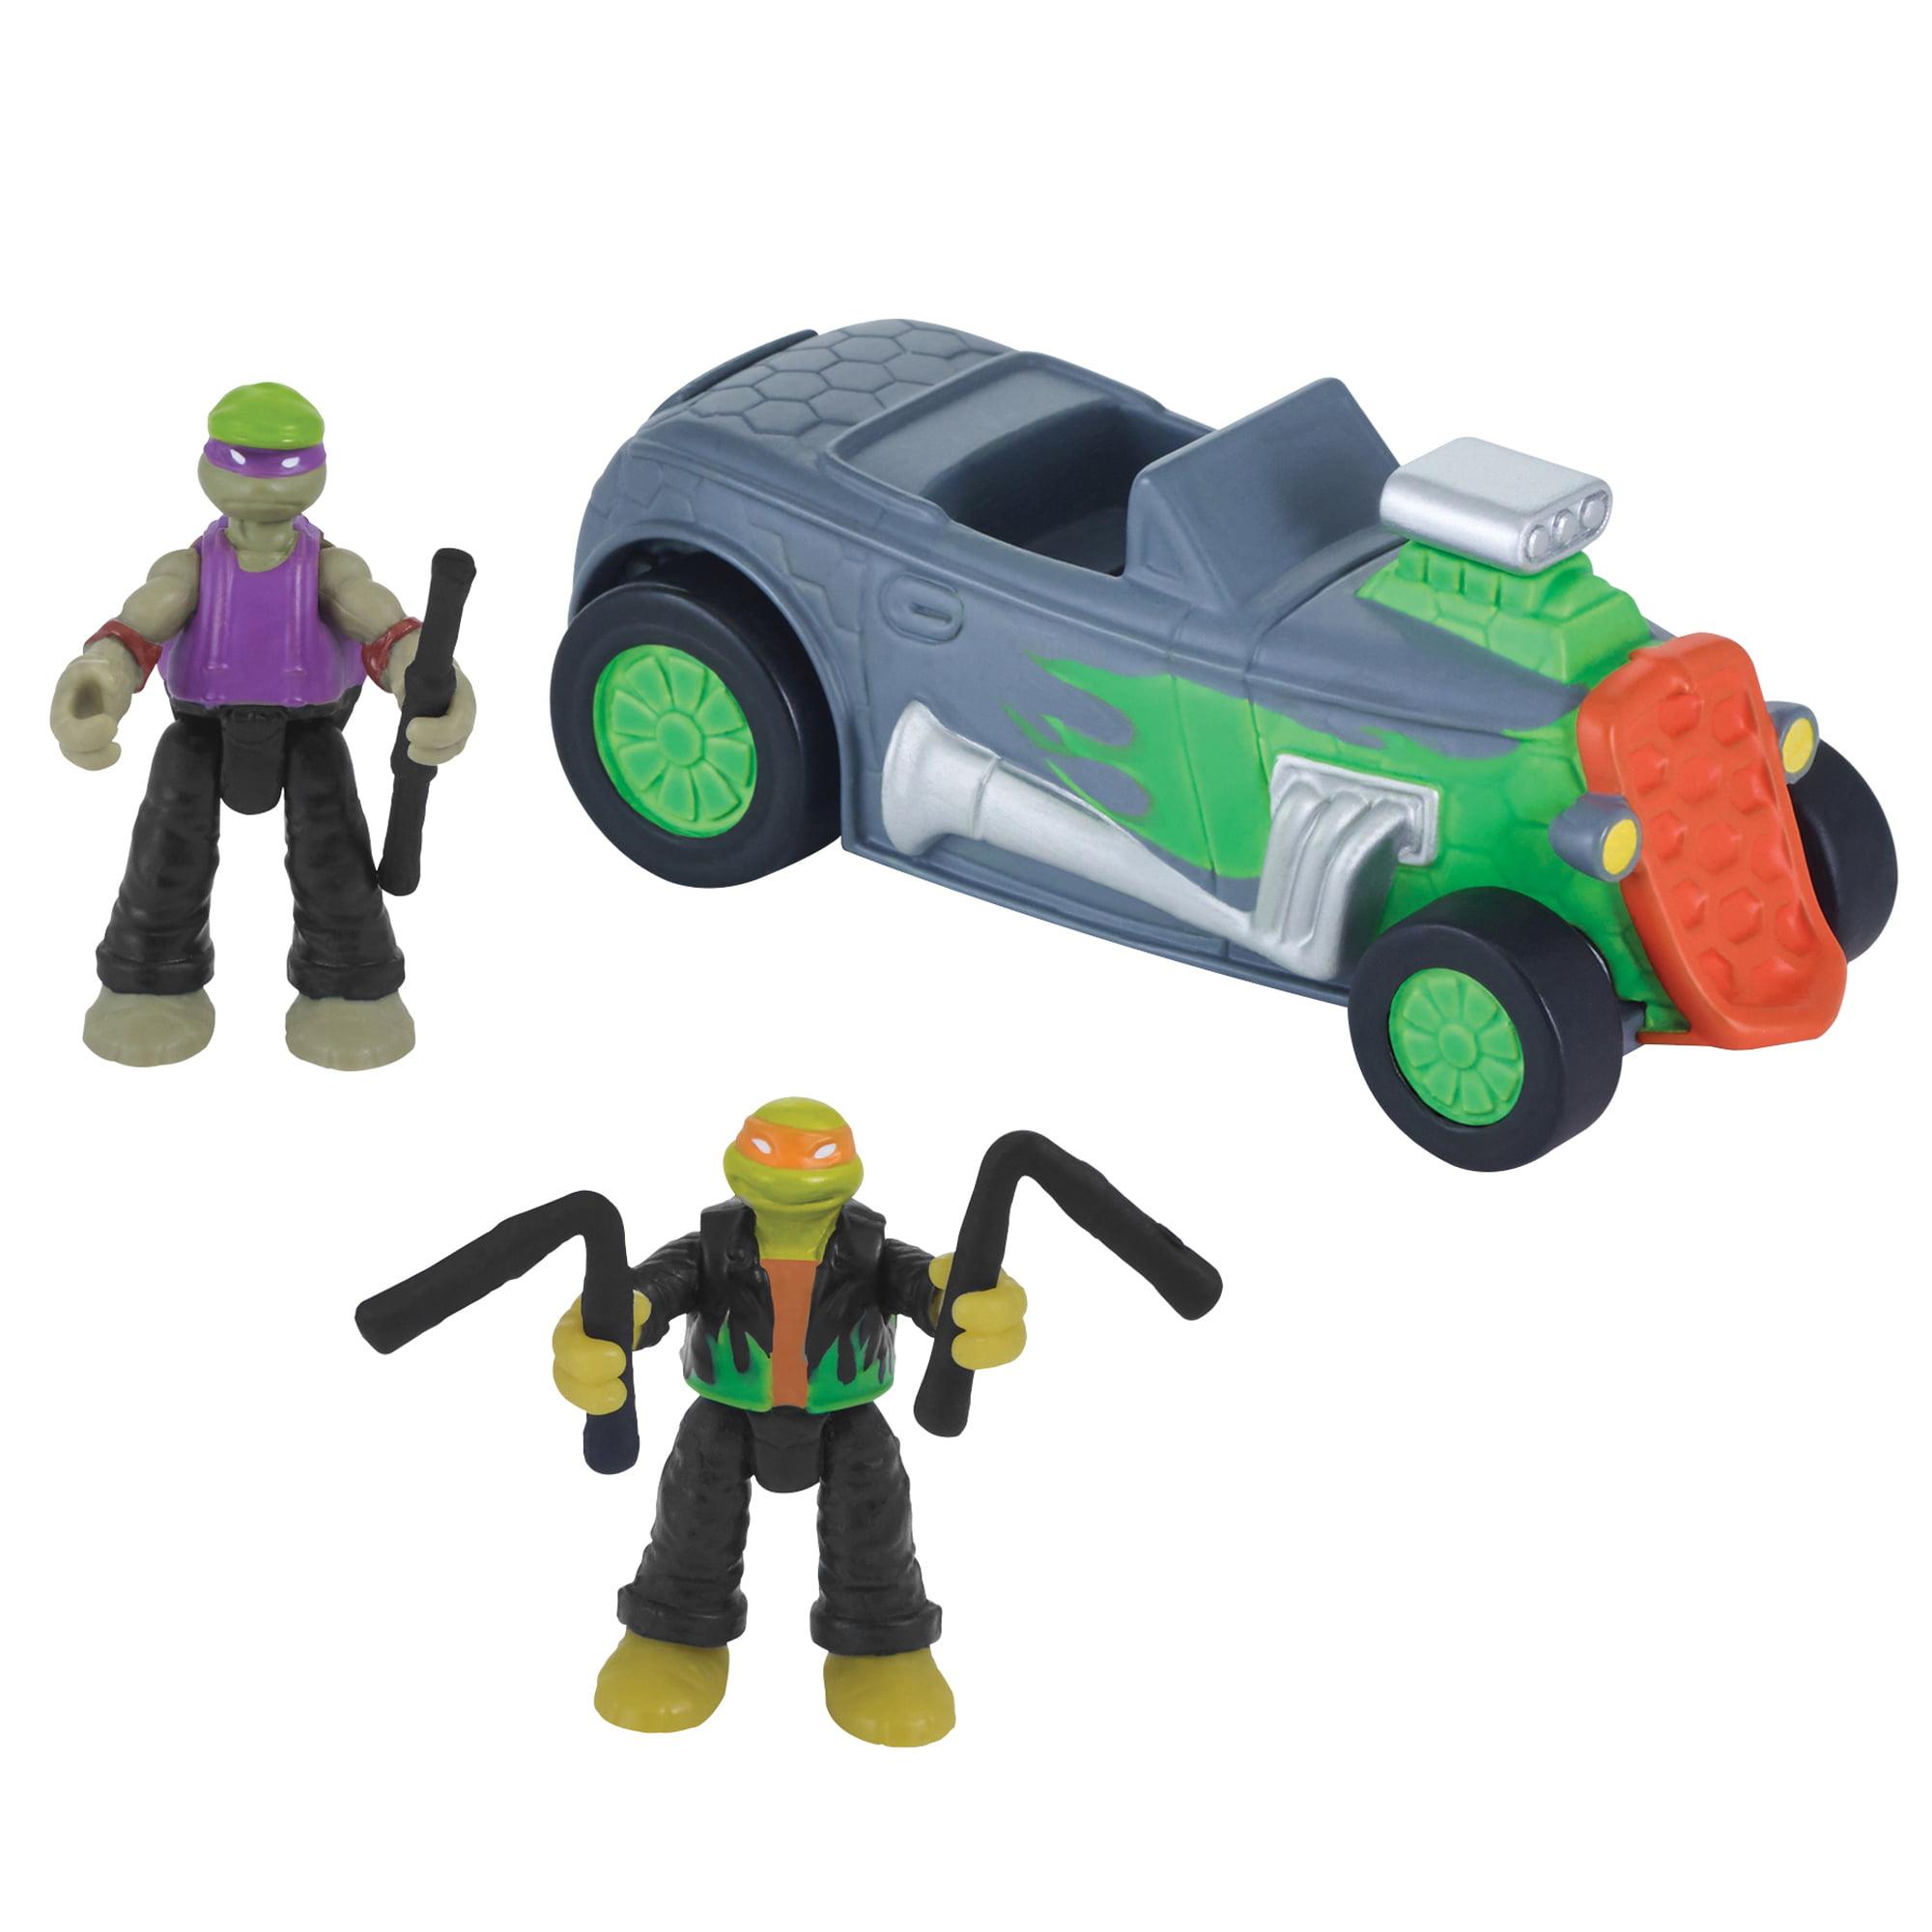 "Teenage Mutant Ninja Turtles Micro Mutant Hot Rod with 1.15"" Michelangelo and Donatello"